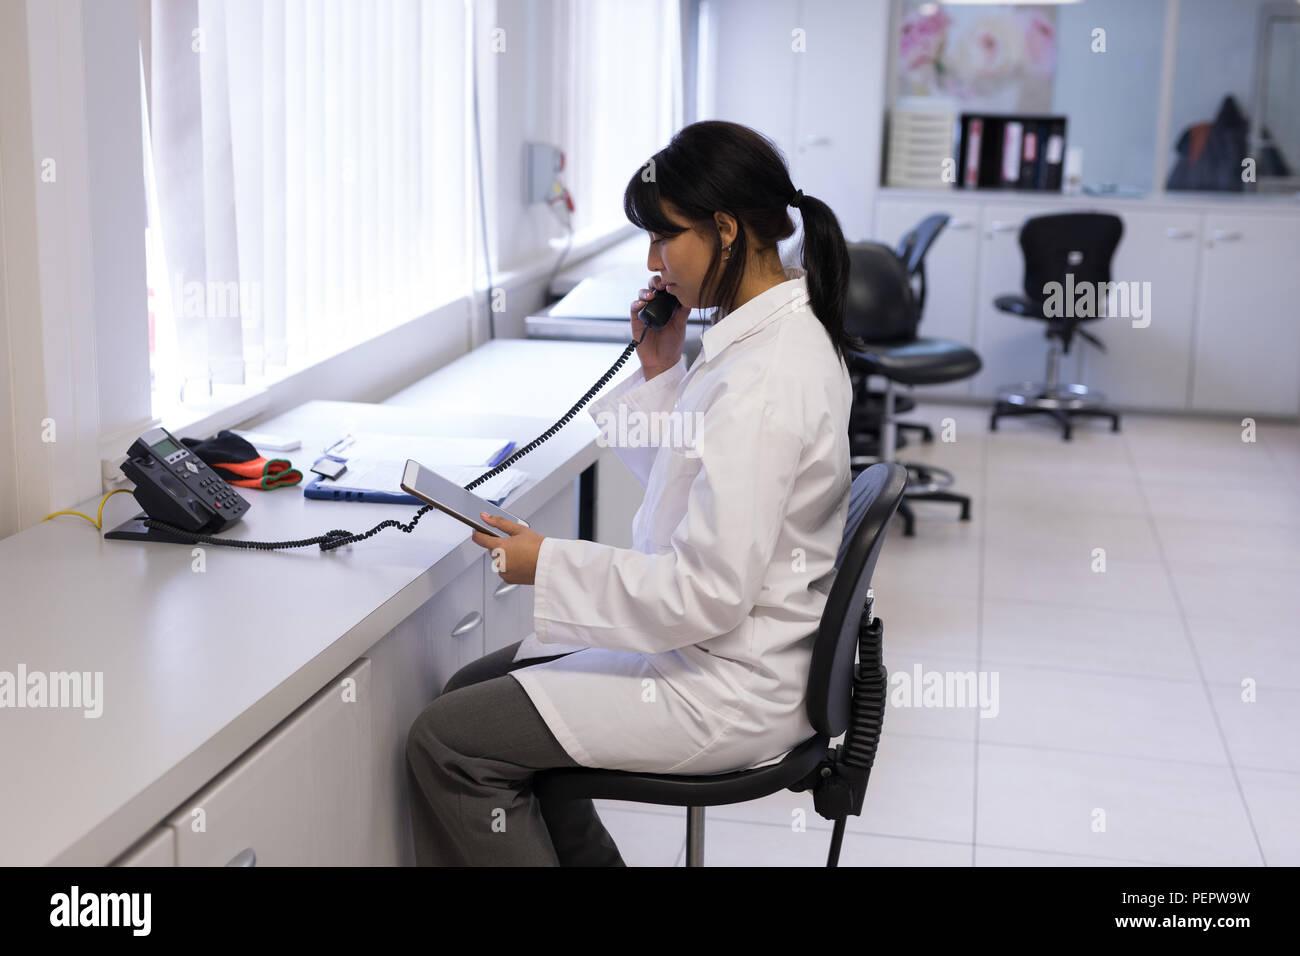 Laboratory technician talking on telephone - Stock Image